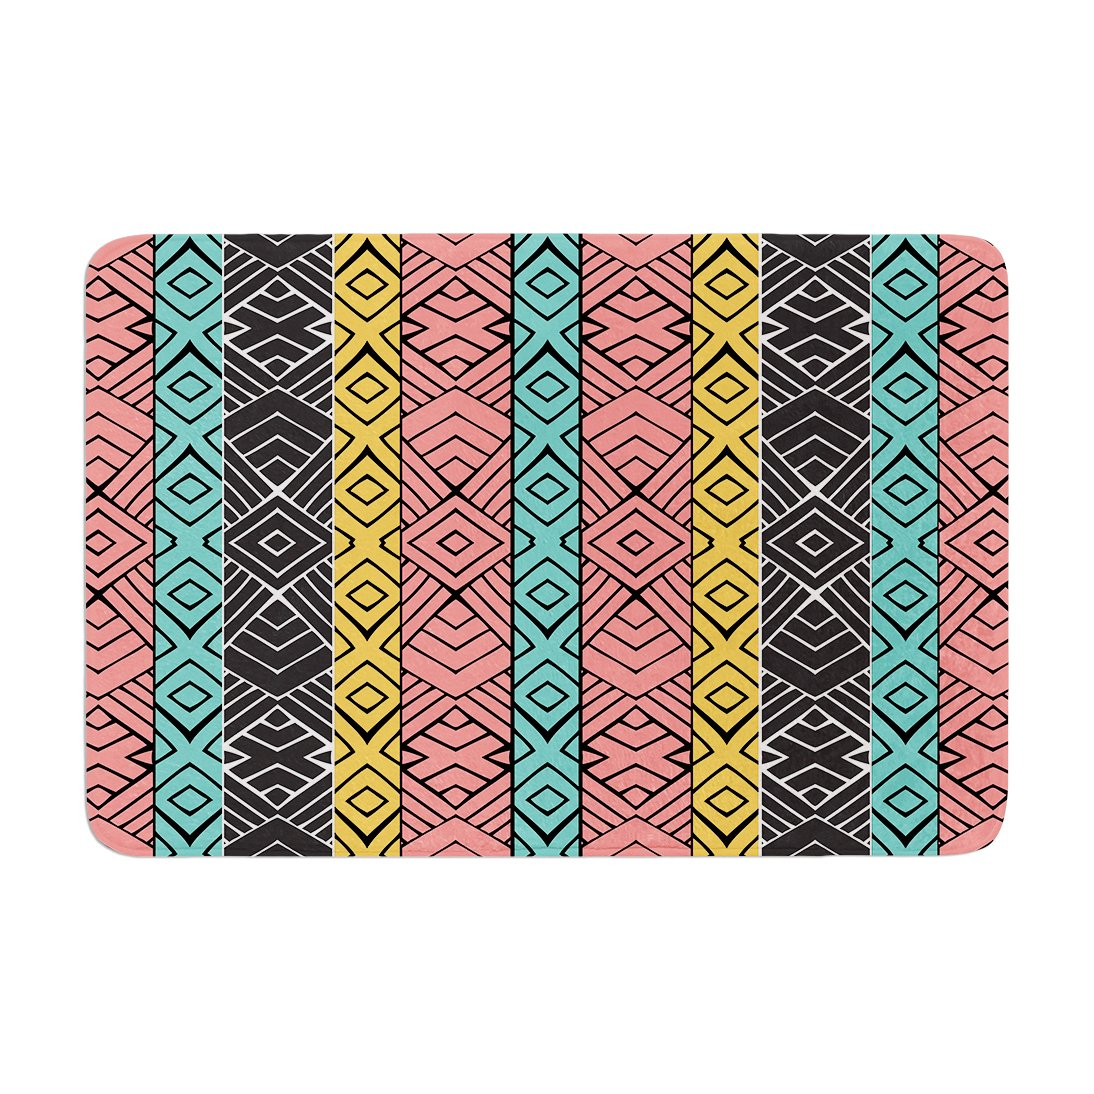 Kess InHouse Pom Graphic Design Artisian Pink Teal Memory Foam Bath Mat 17 by 24